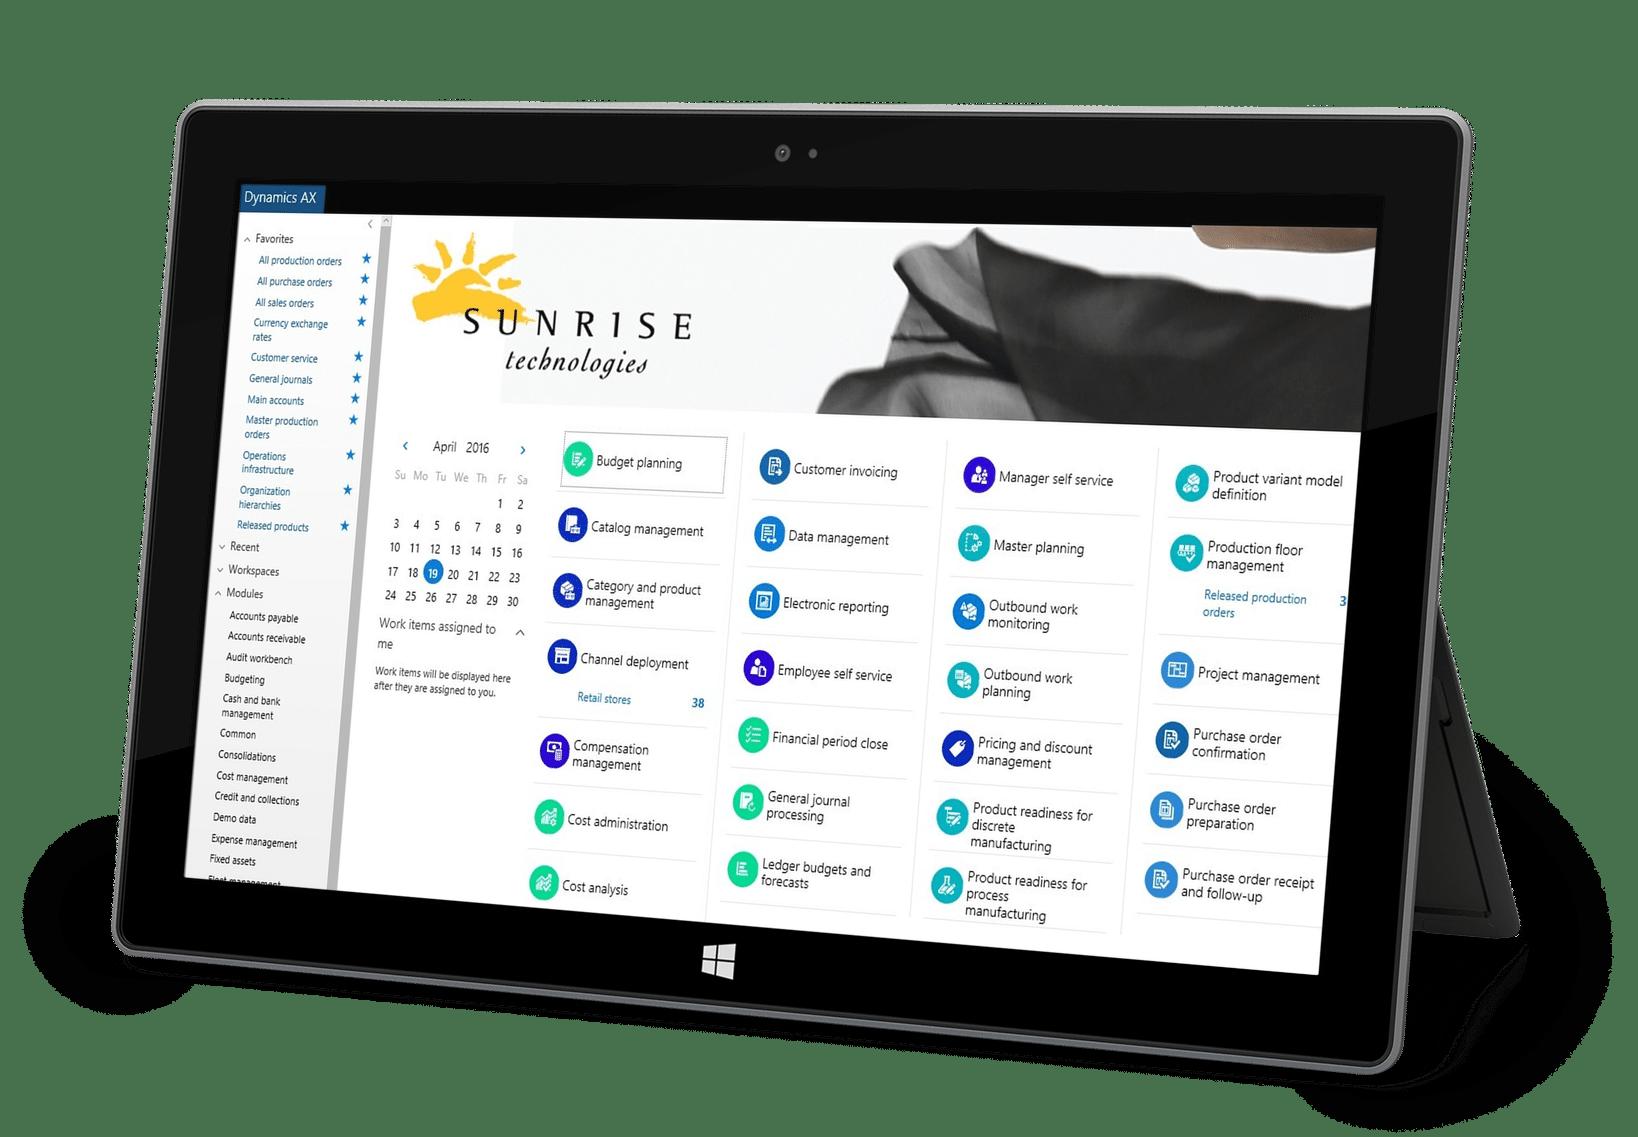 Sunrise Microsoft Dynamics AX Surface